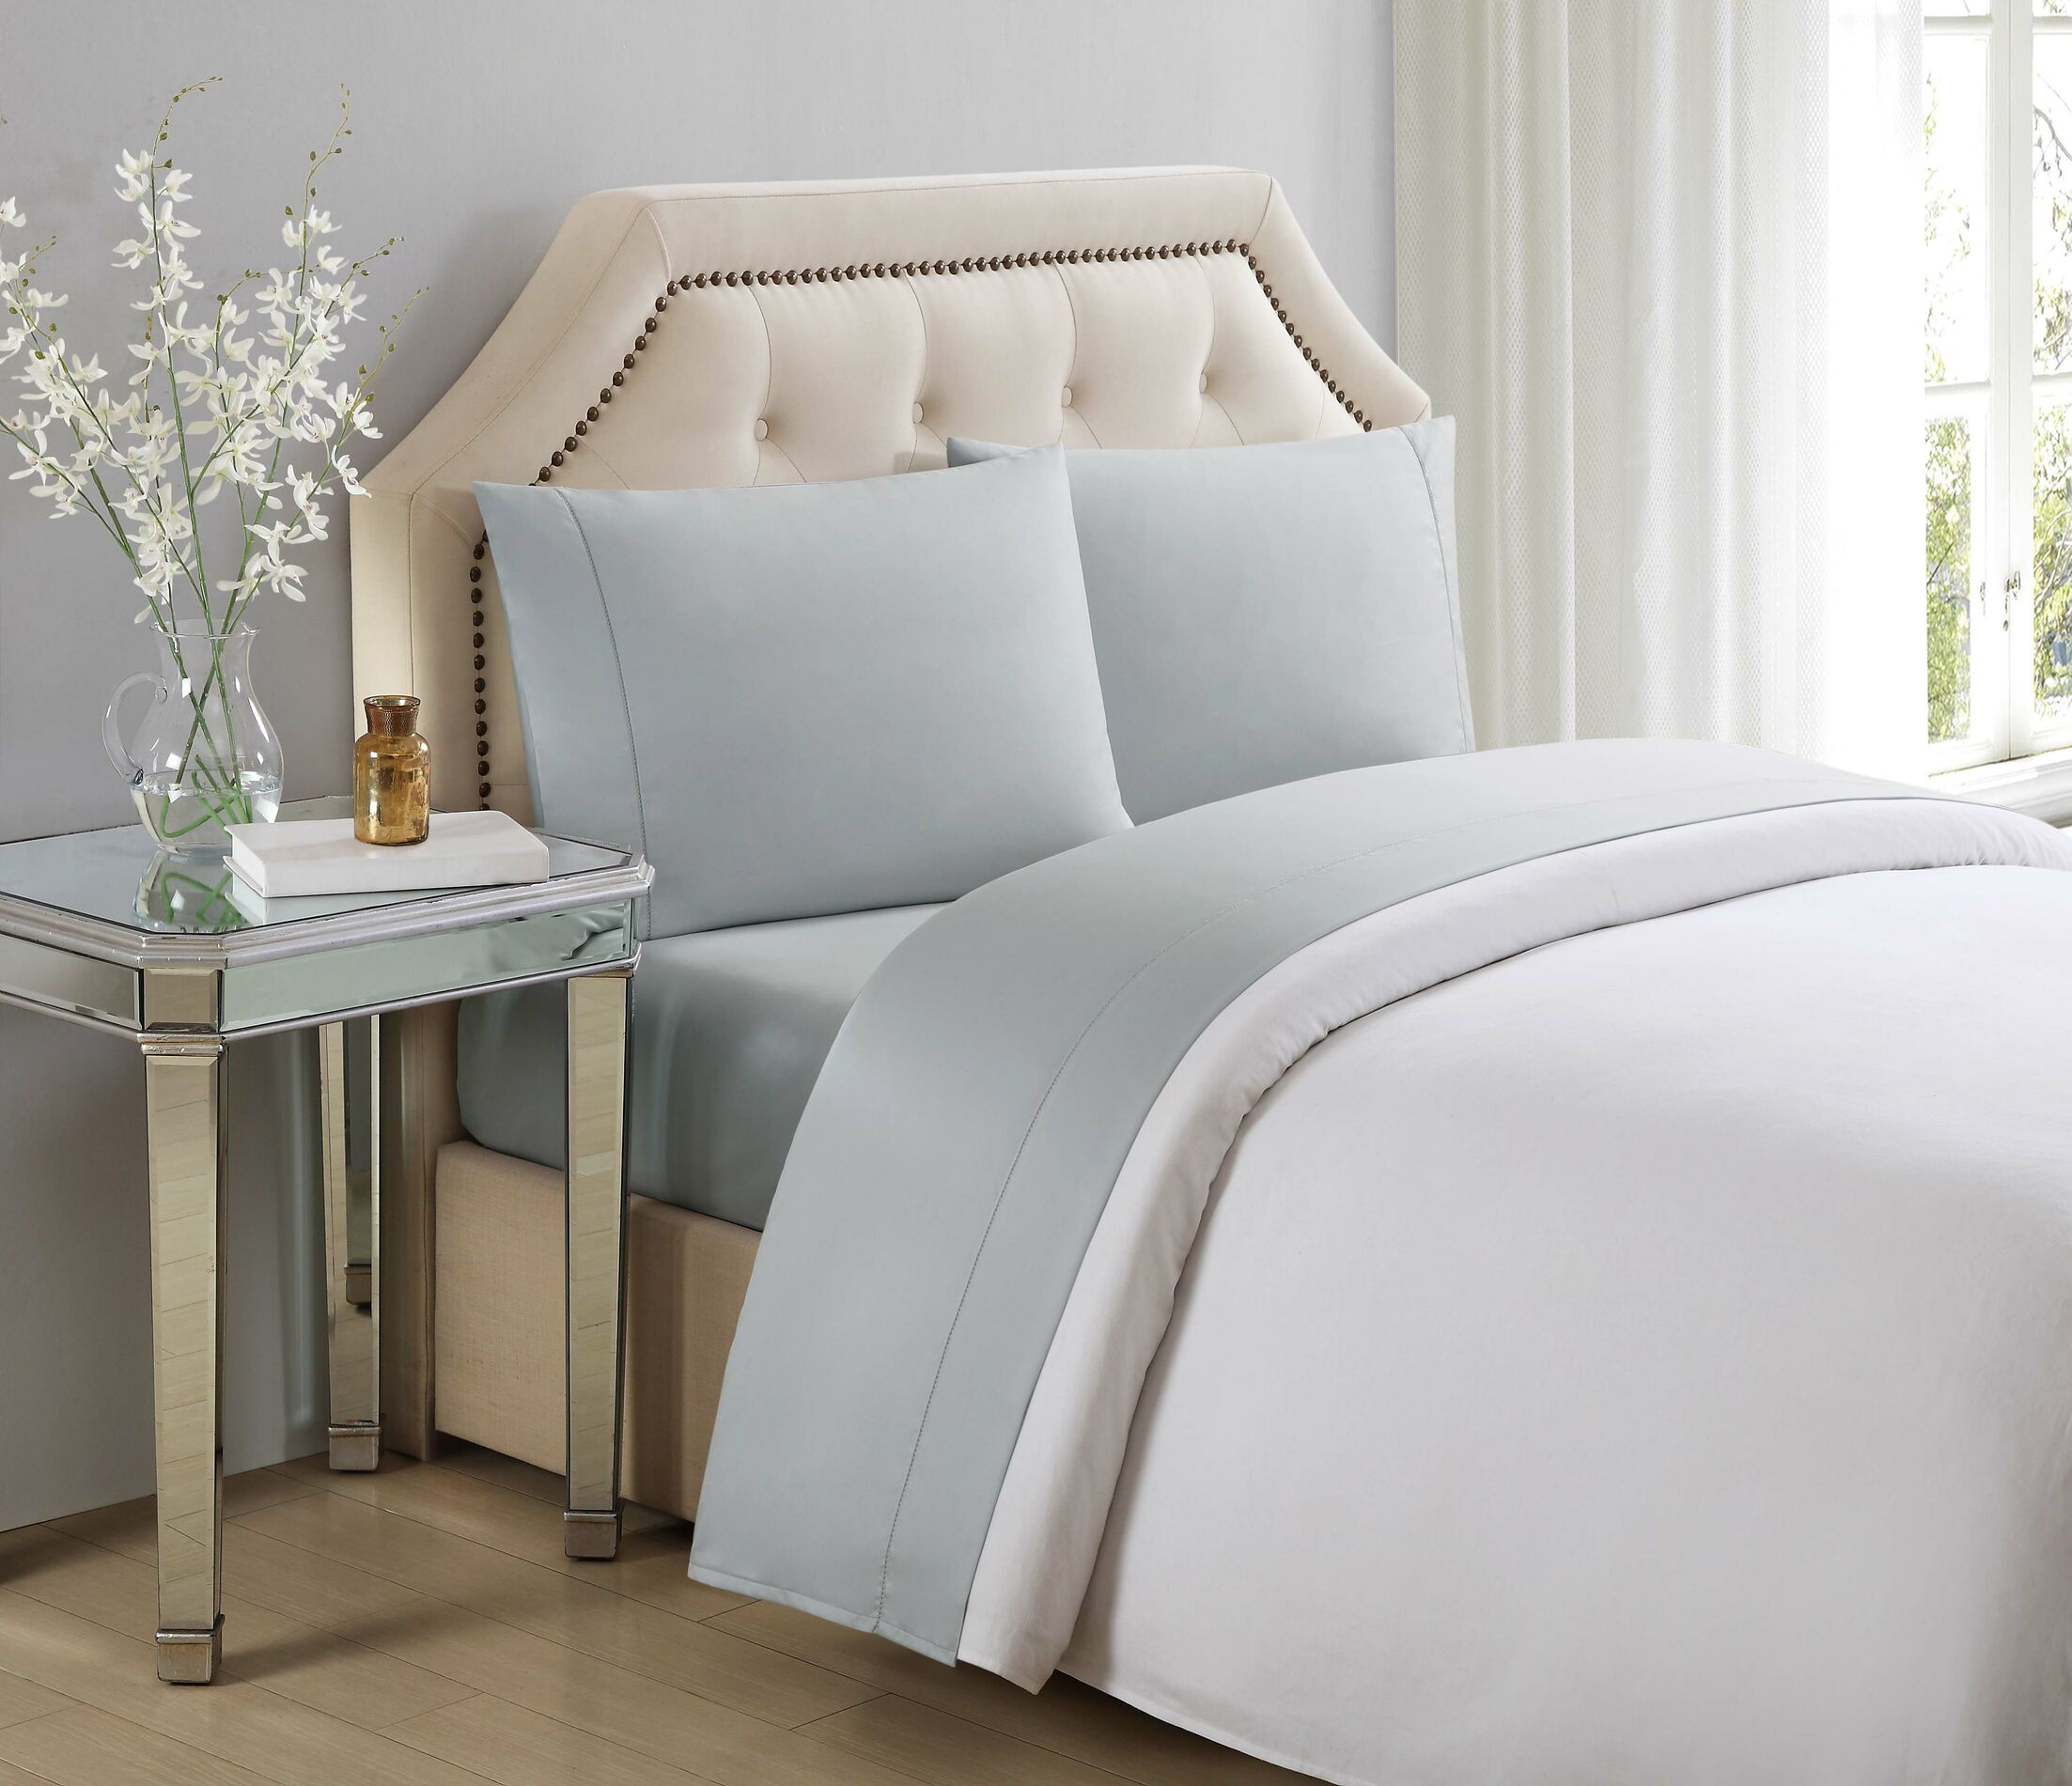 610 Thread Count 100% Cotton Sheet Set Color: Gray Violet, Size: King